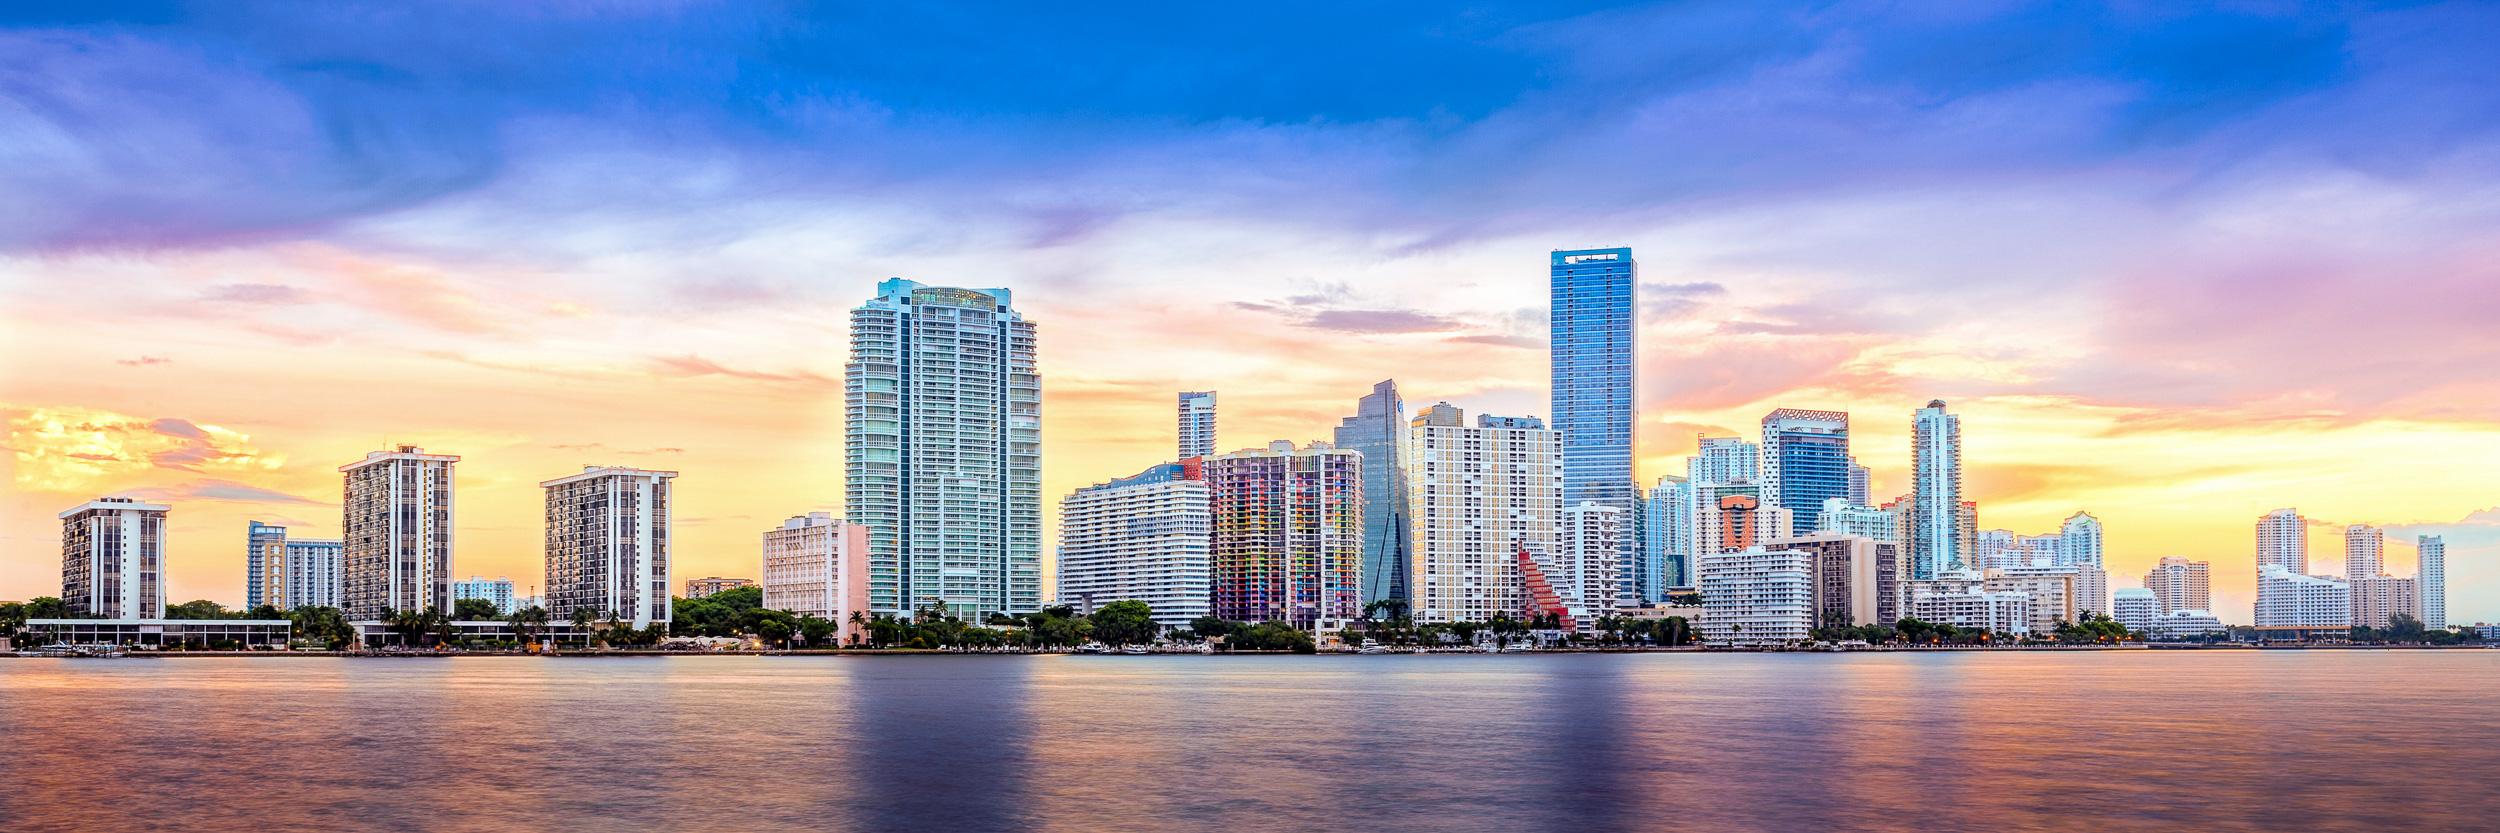 Miami_waterfront_sunrise_Miami_Fort_Lauderdale_commercial_photographer_Franklin_Castillo.jpg